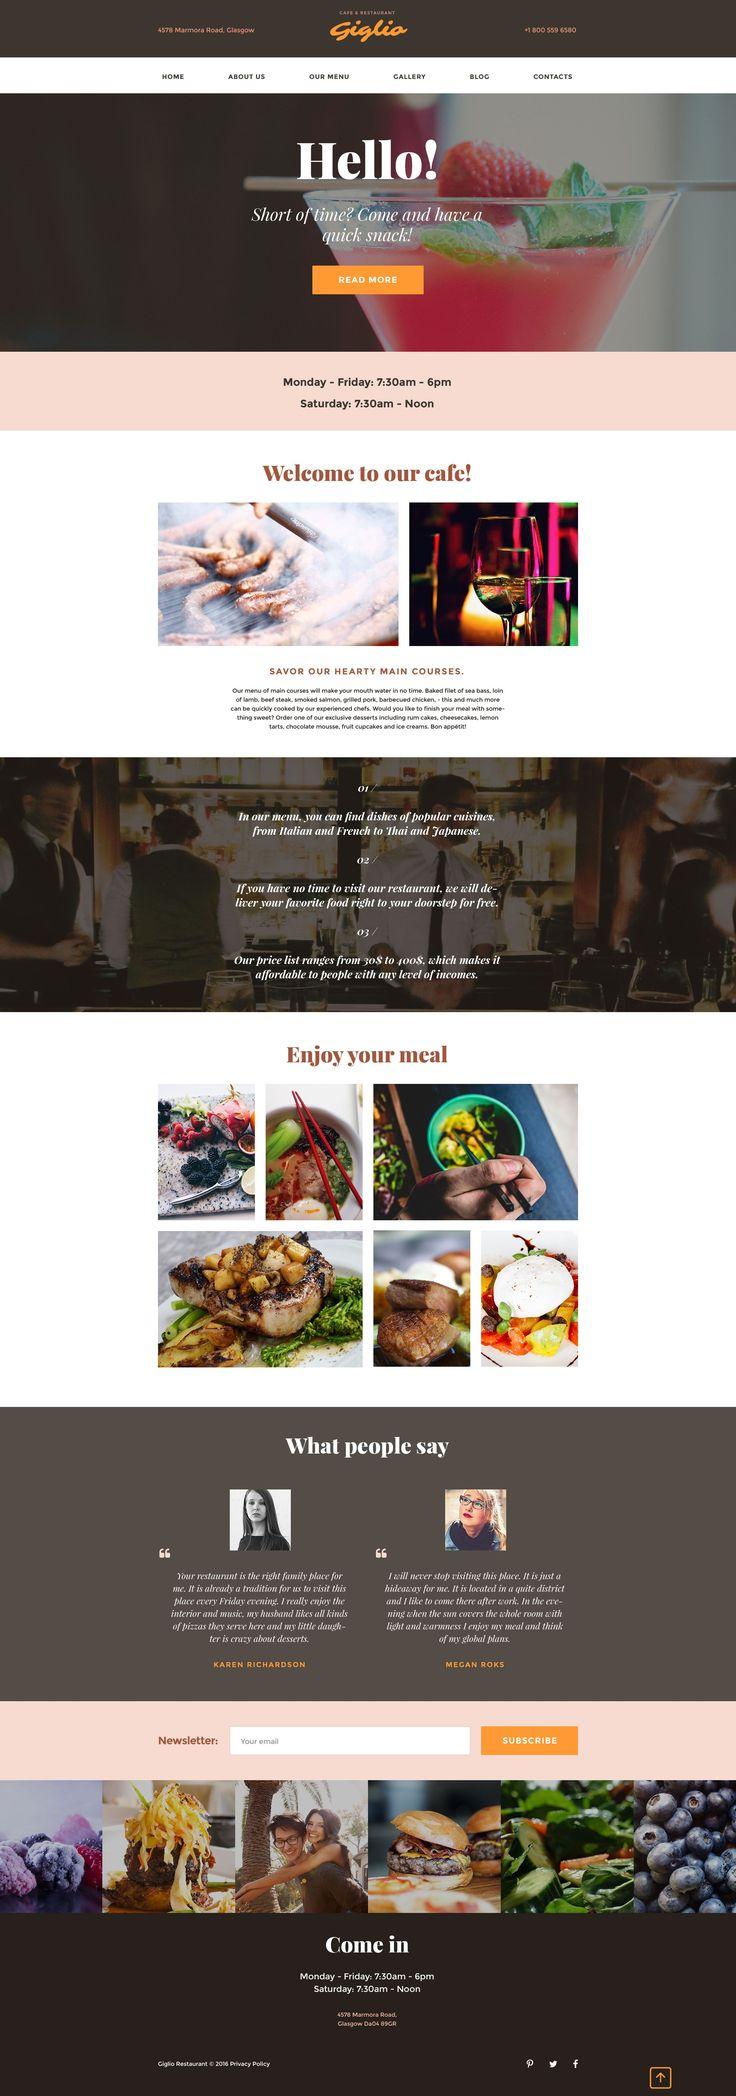 Premium Website Templates Browse web templates designed